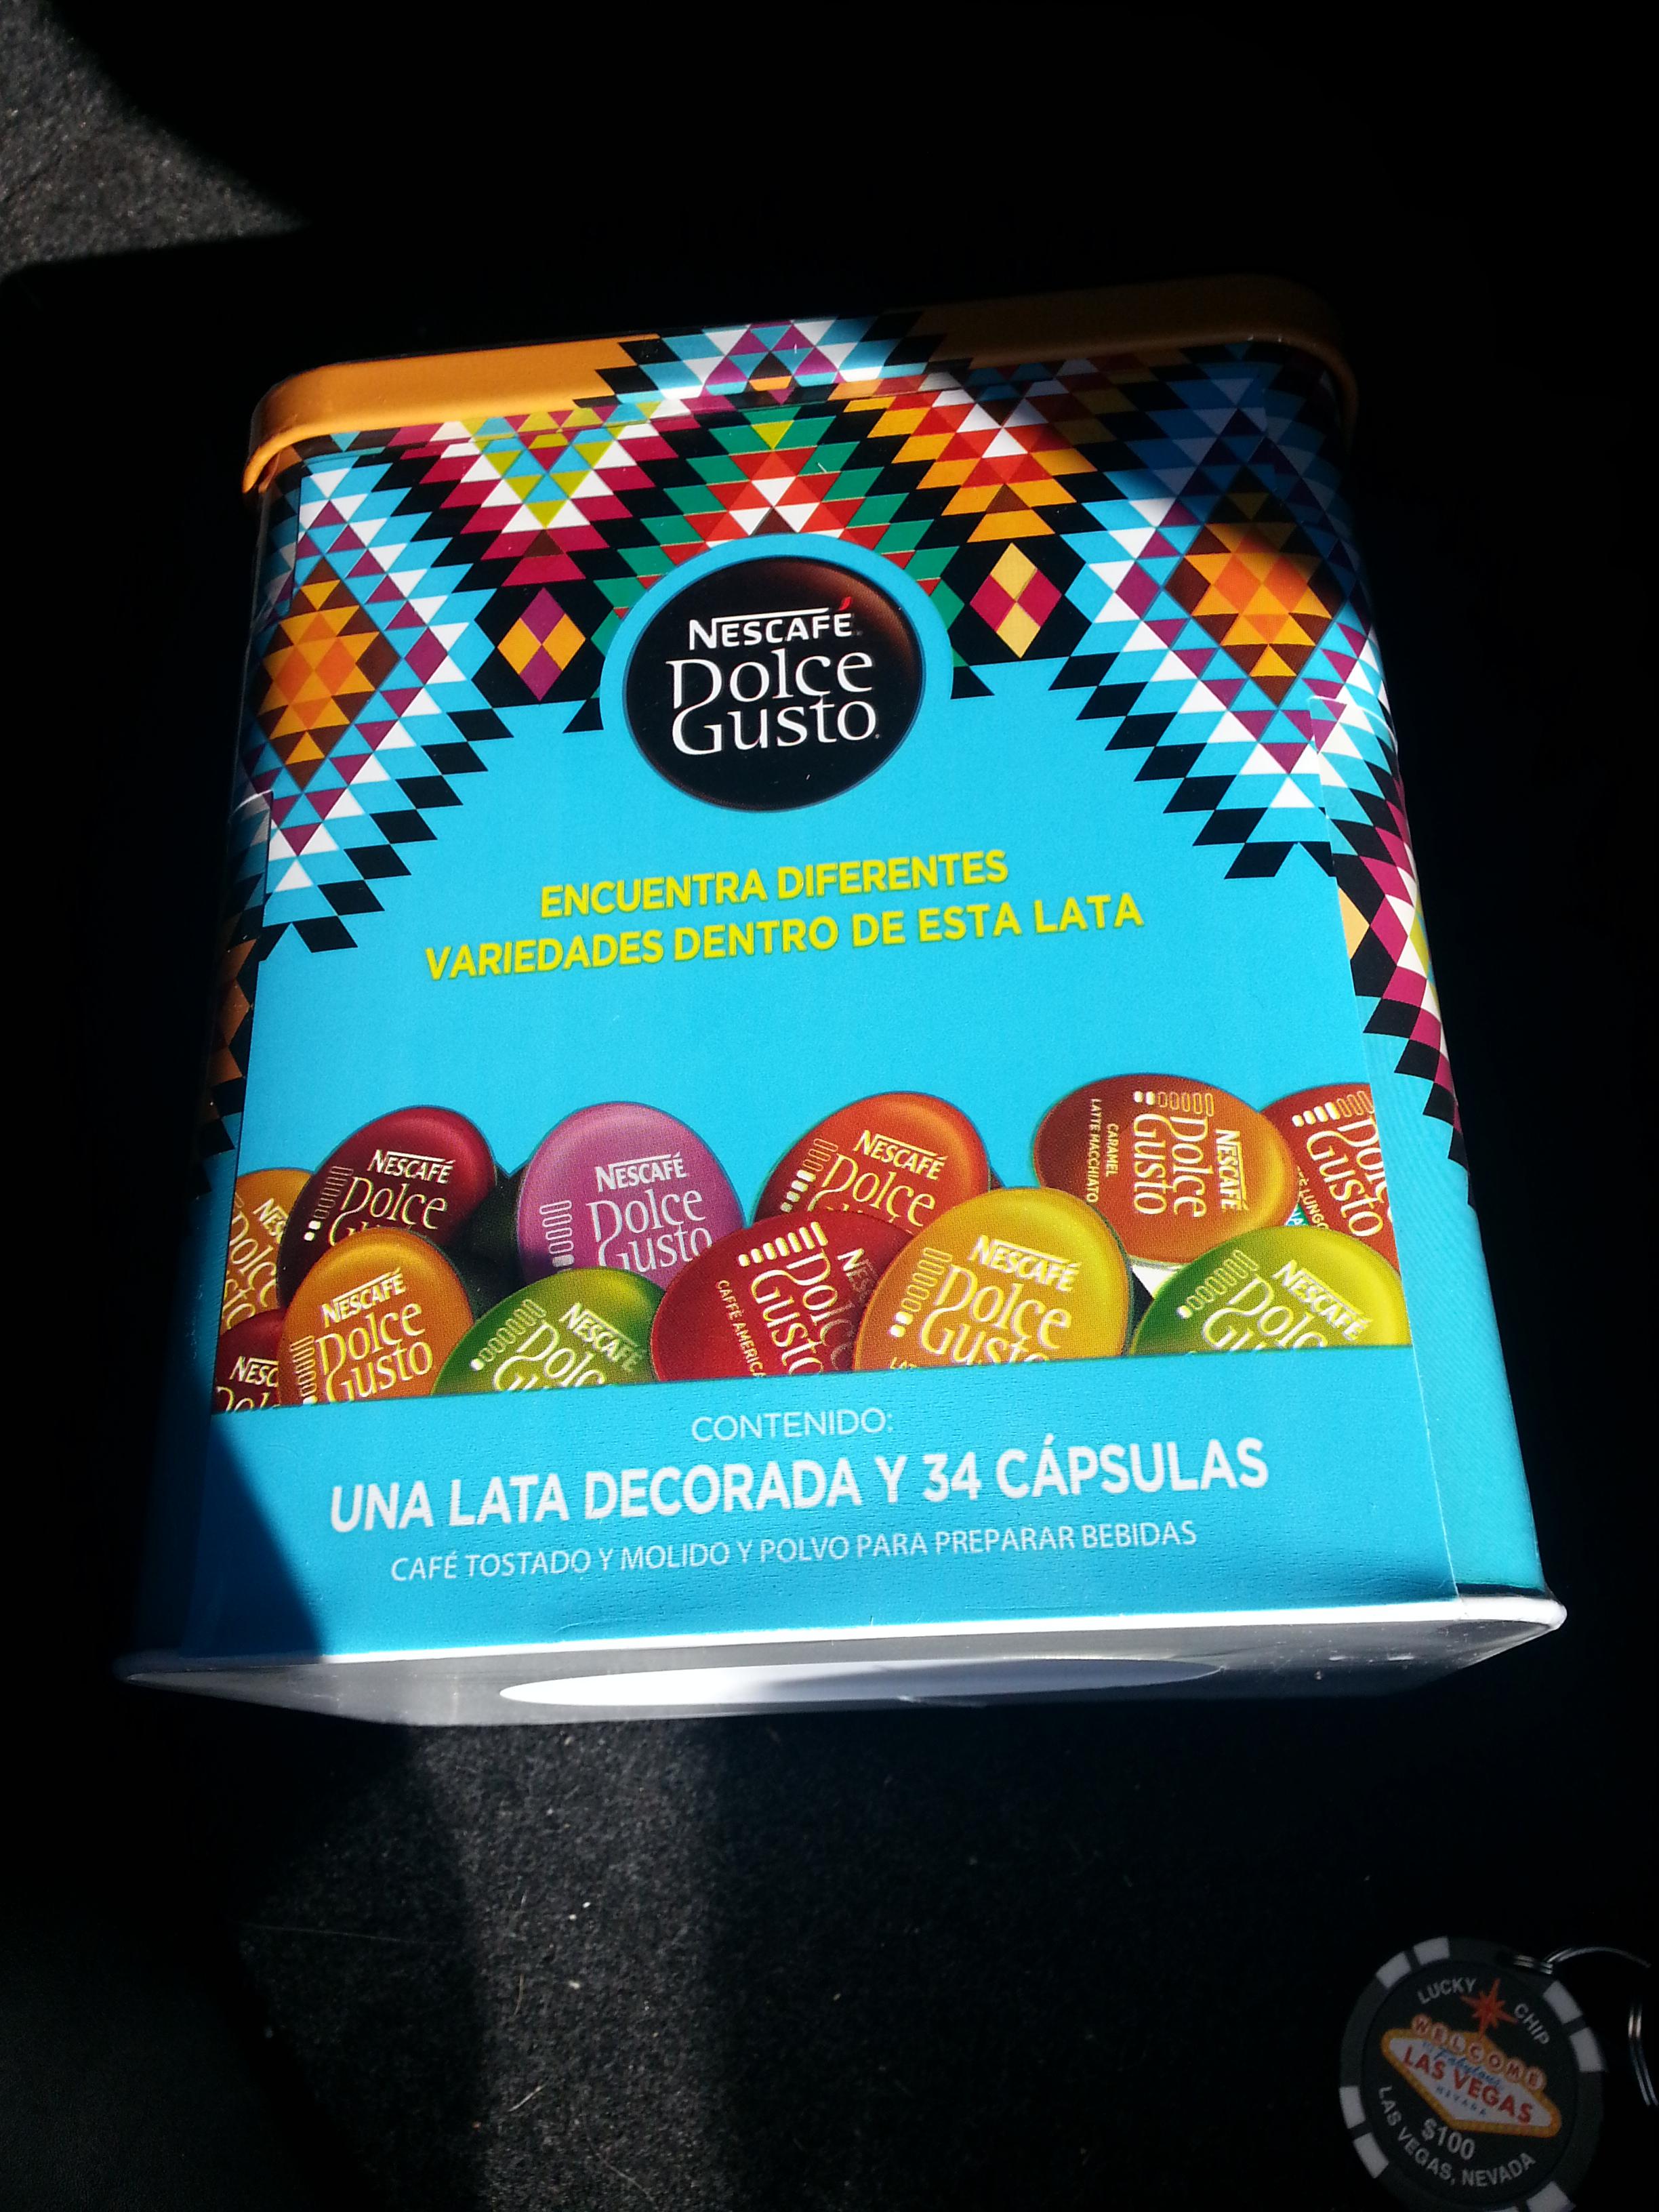 Sam's Club: Caja de 34 cápsulas de nescafe dolce gusto con caja metálica decorada